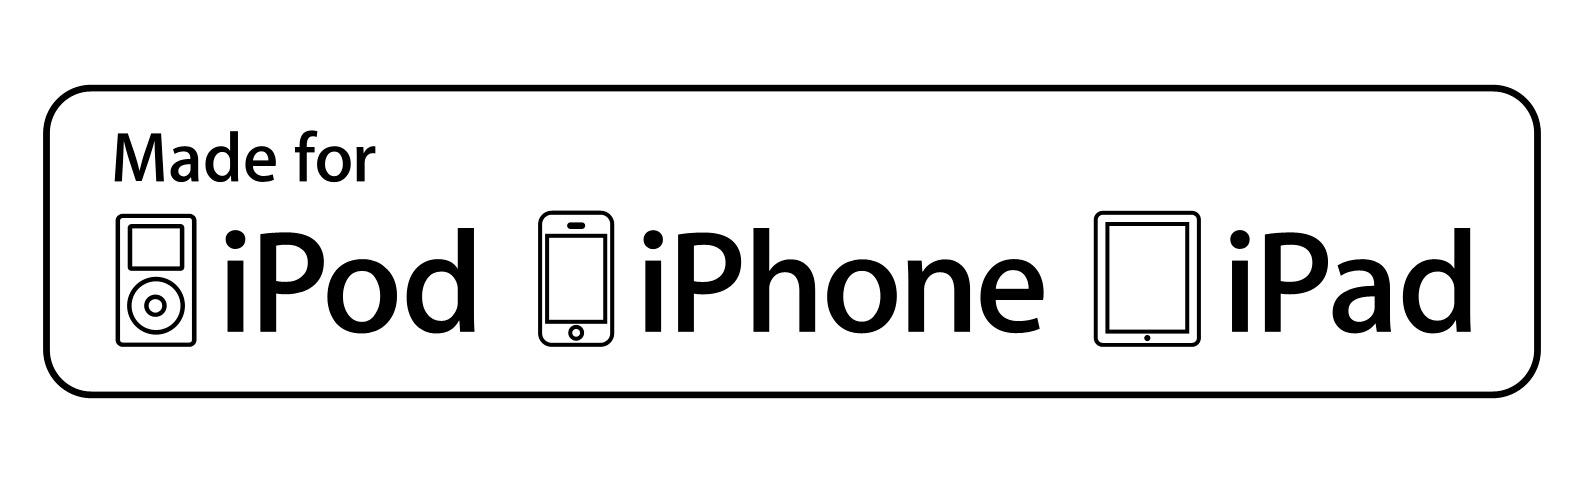 Made for iPod iPhone iPad